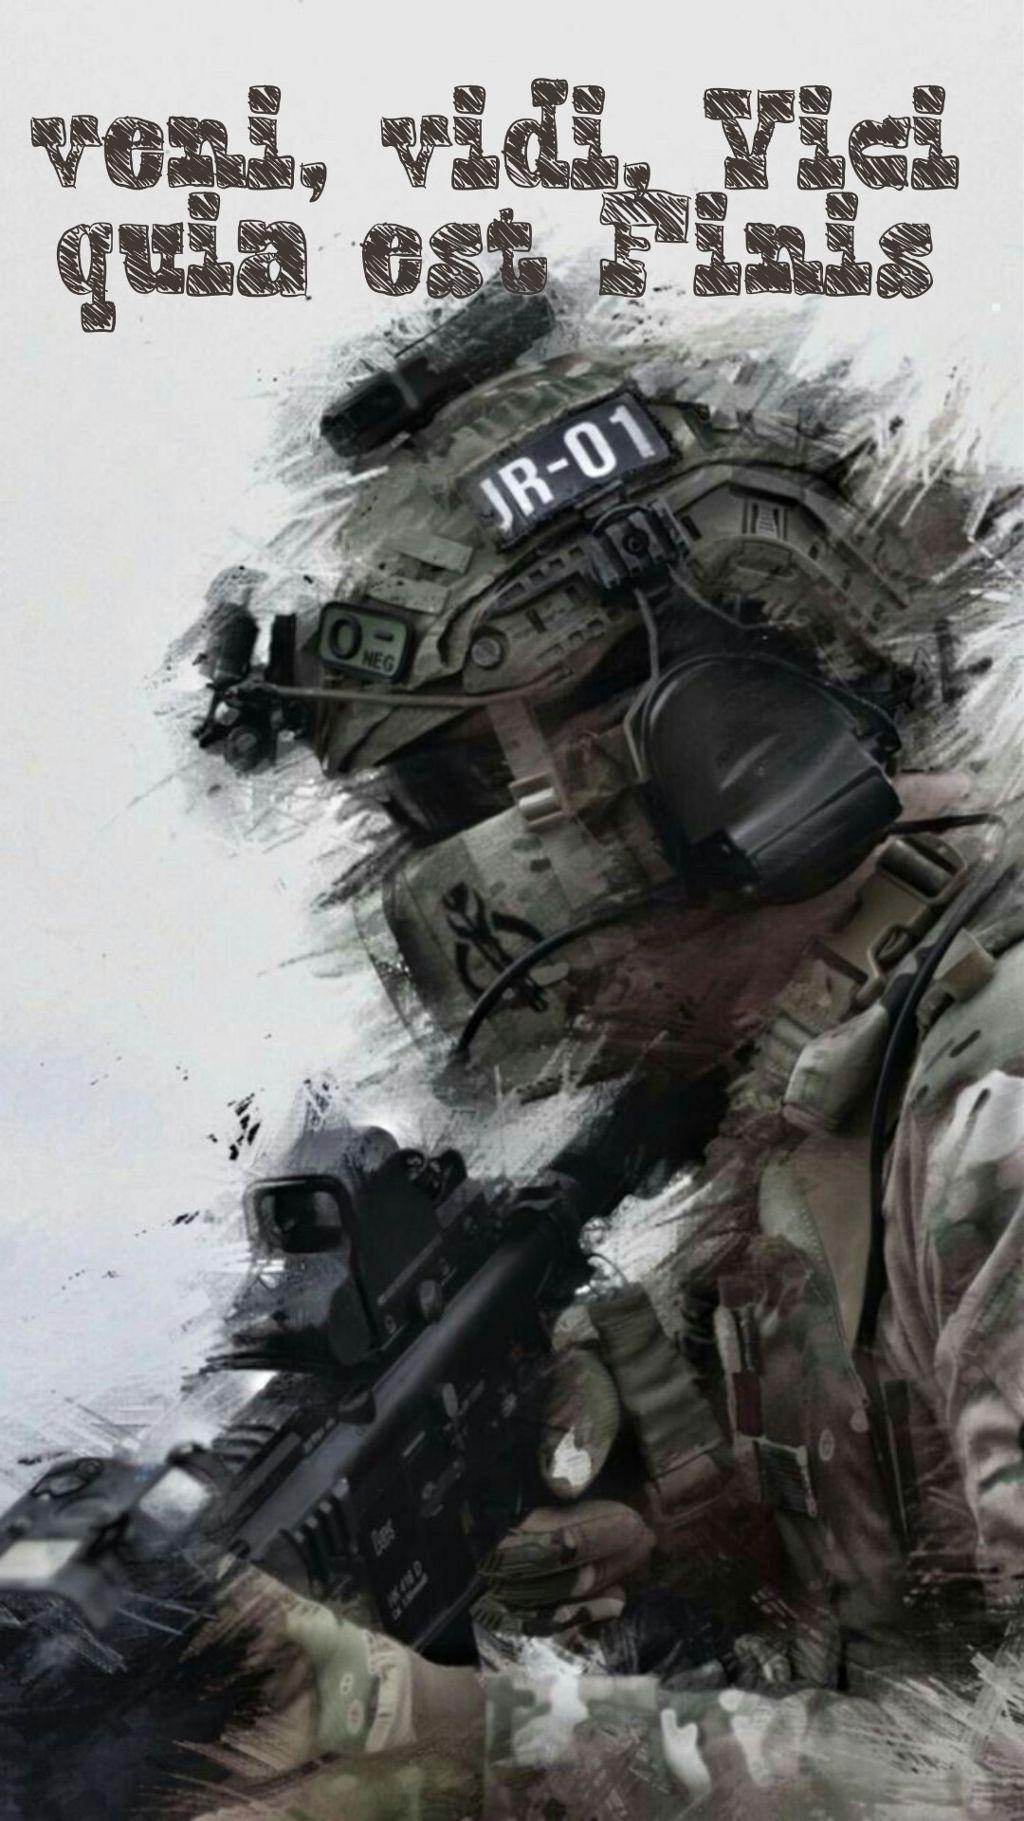 Police Policia Swat Latin Guerrero Motivacion Military